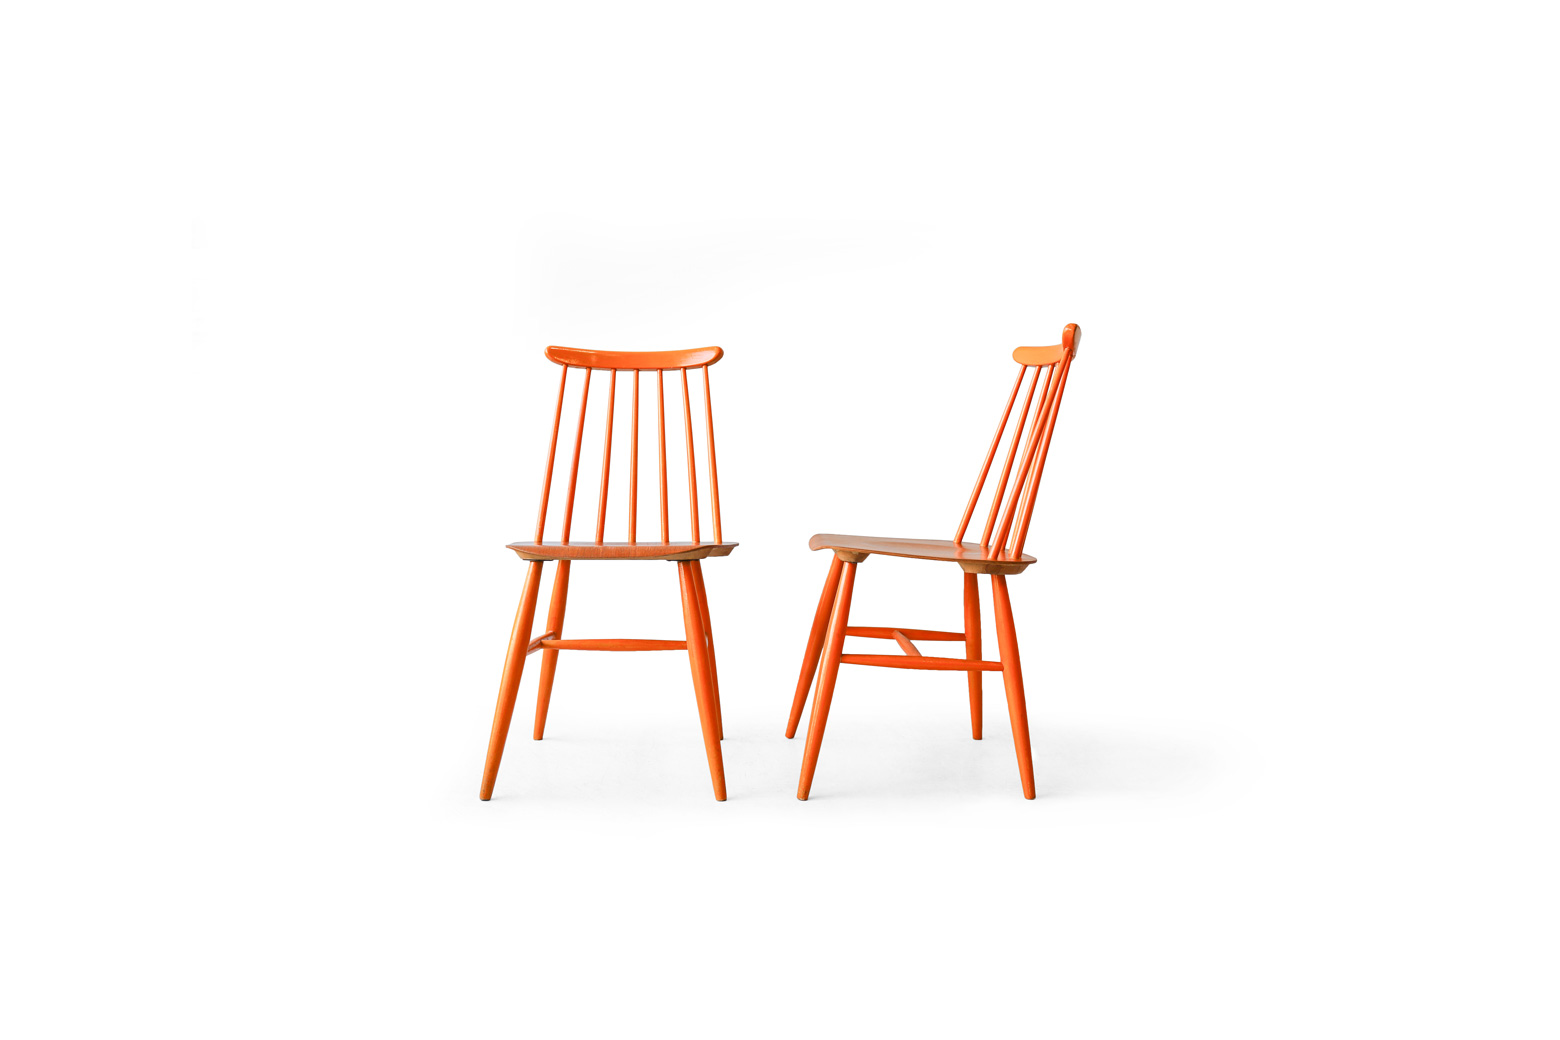 Edsbyverken Fanett Chair Ilmari Tapiovaara/ファネットチェア イルマリ・タピオヴァーラ ダイニングチェア 椅子 北欧ヴィンテージ